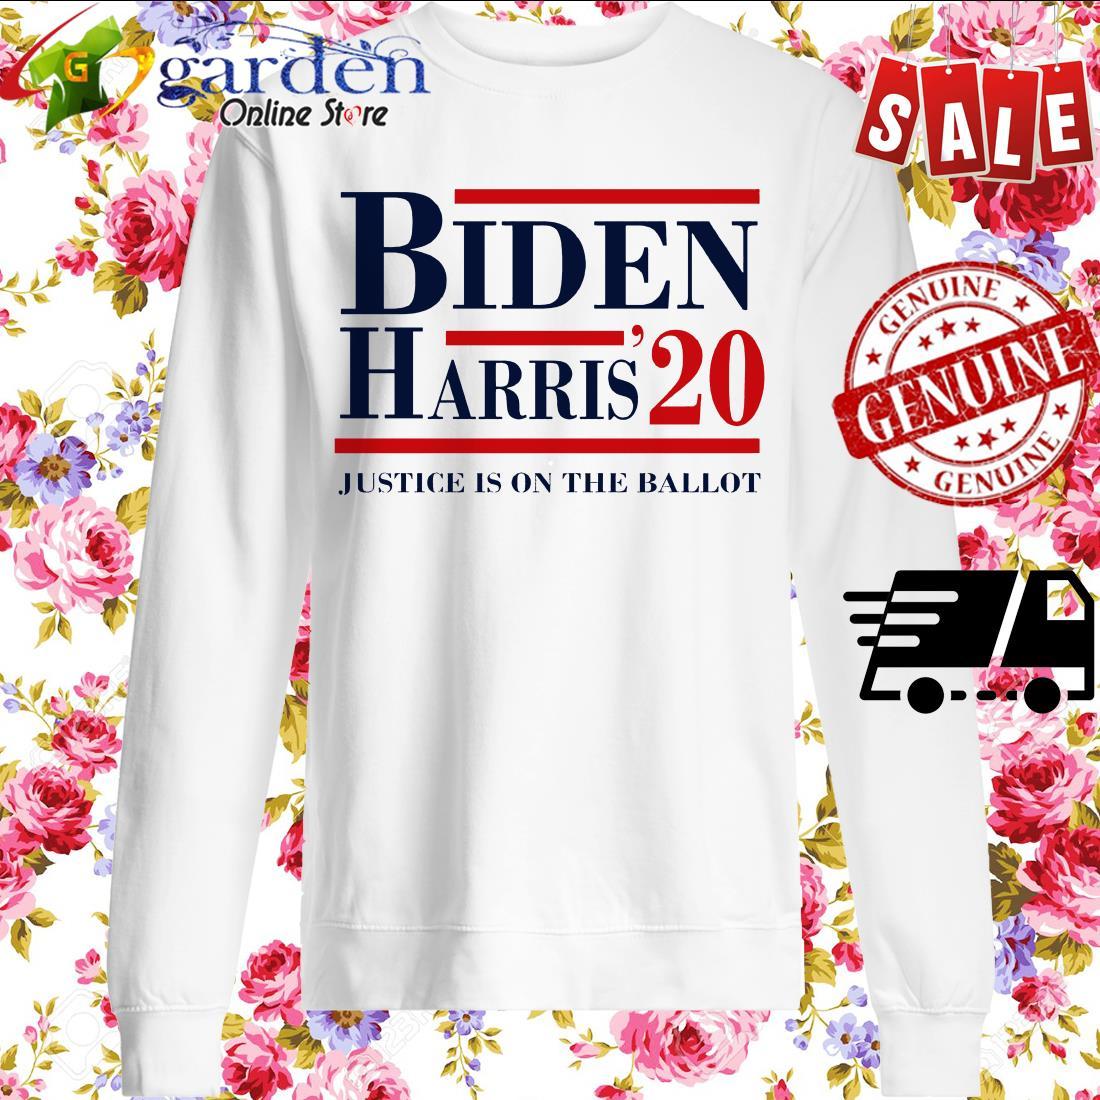 Joe Biden Kamala Harris 2020 Justice Is On The Ballot Shirt Tank Top V Neck For Men And Women